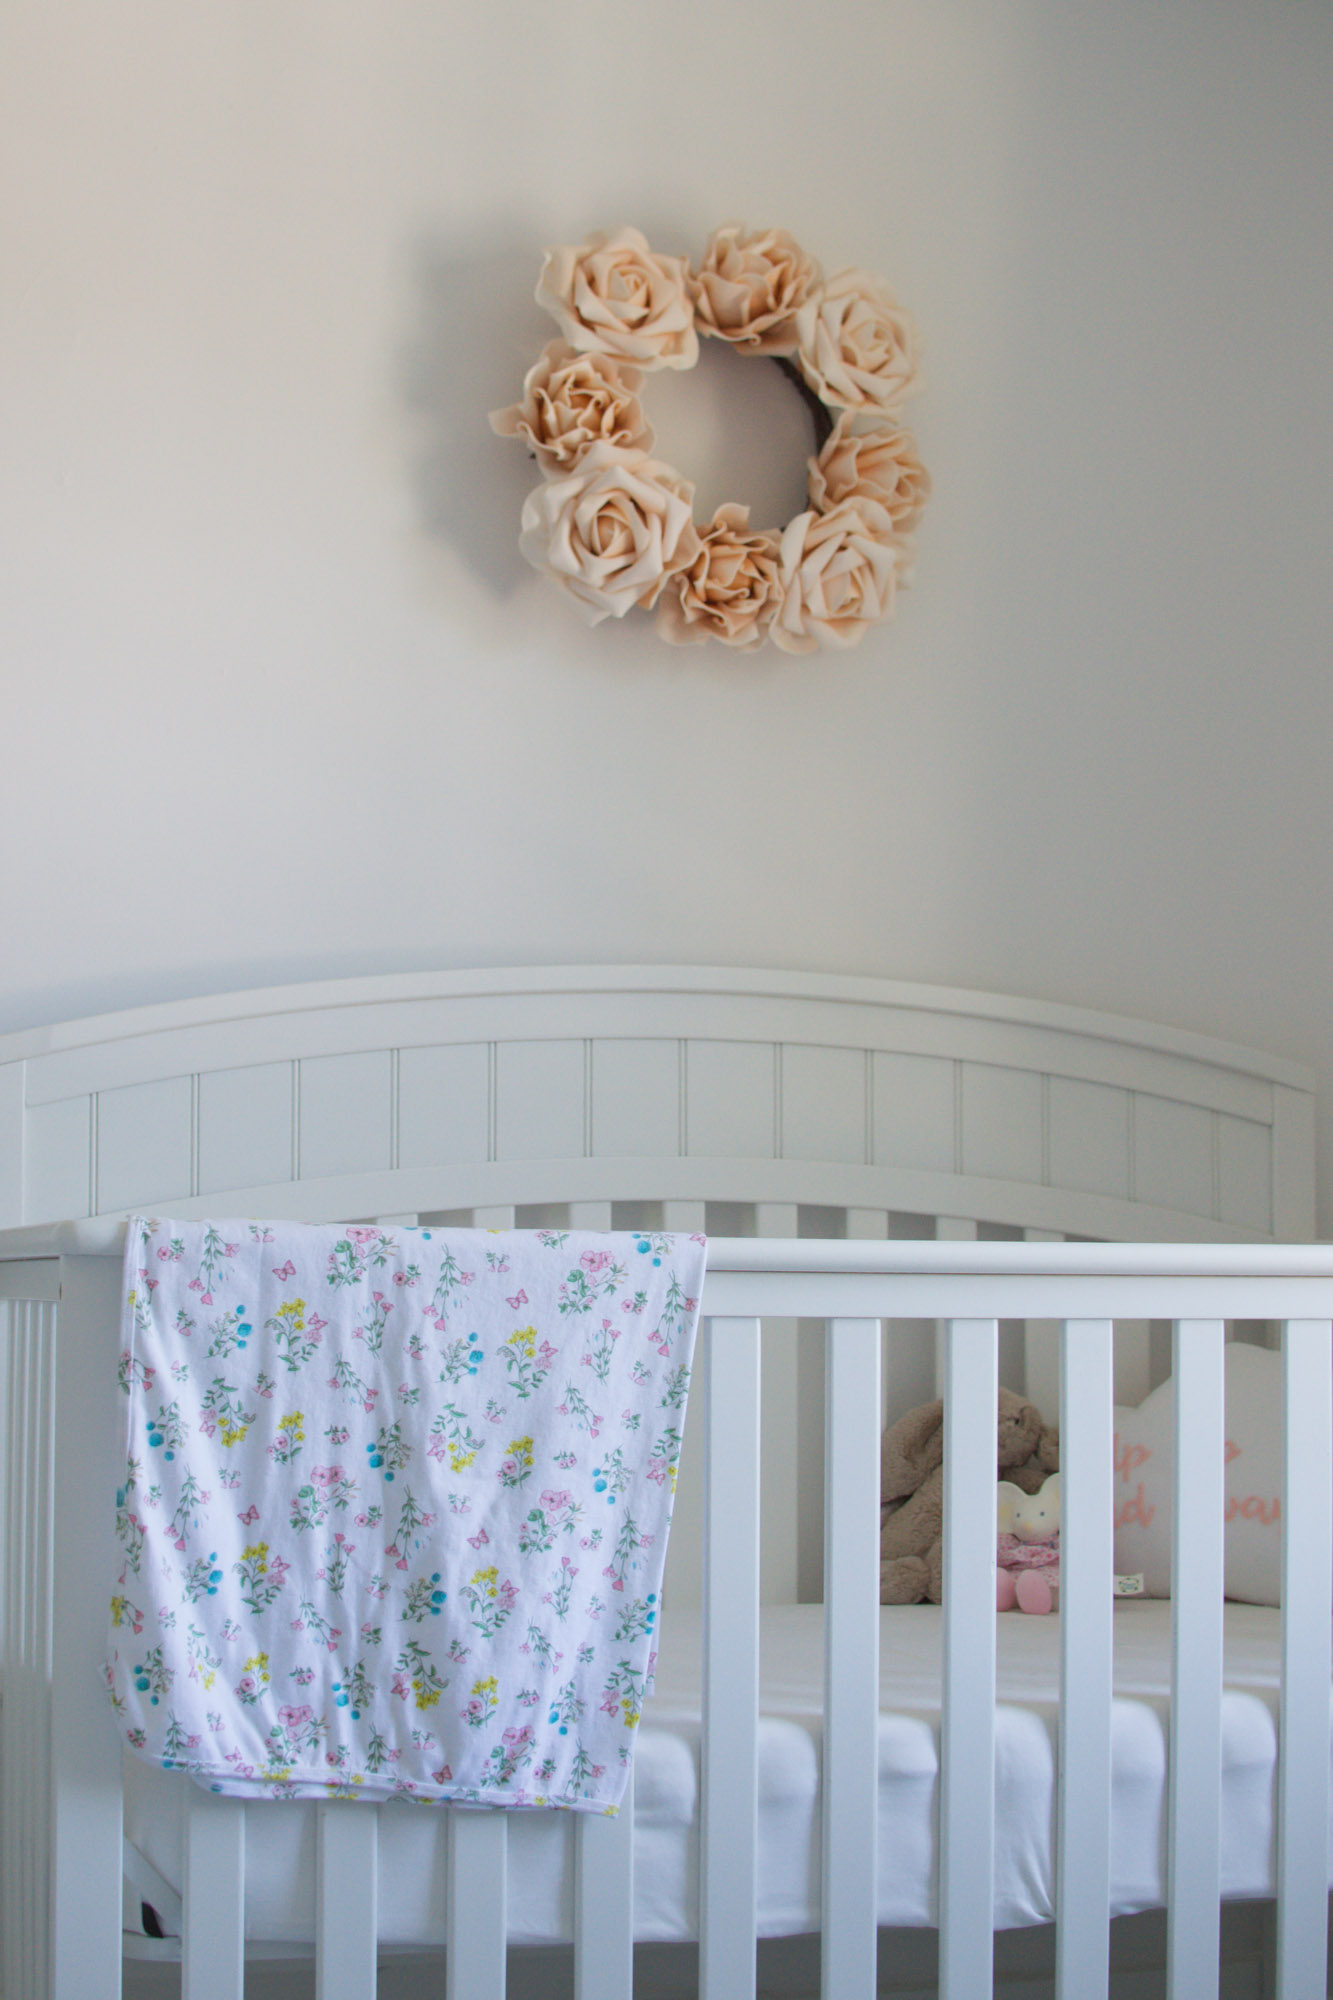 Wild Rosebuds Girls Nursery Room Details